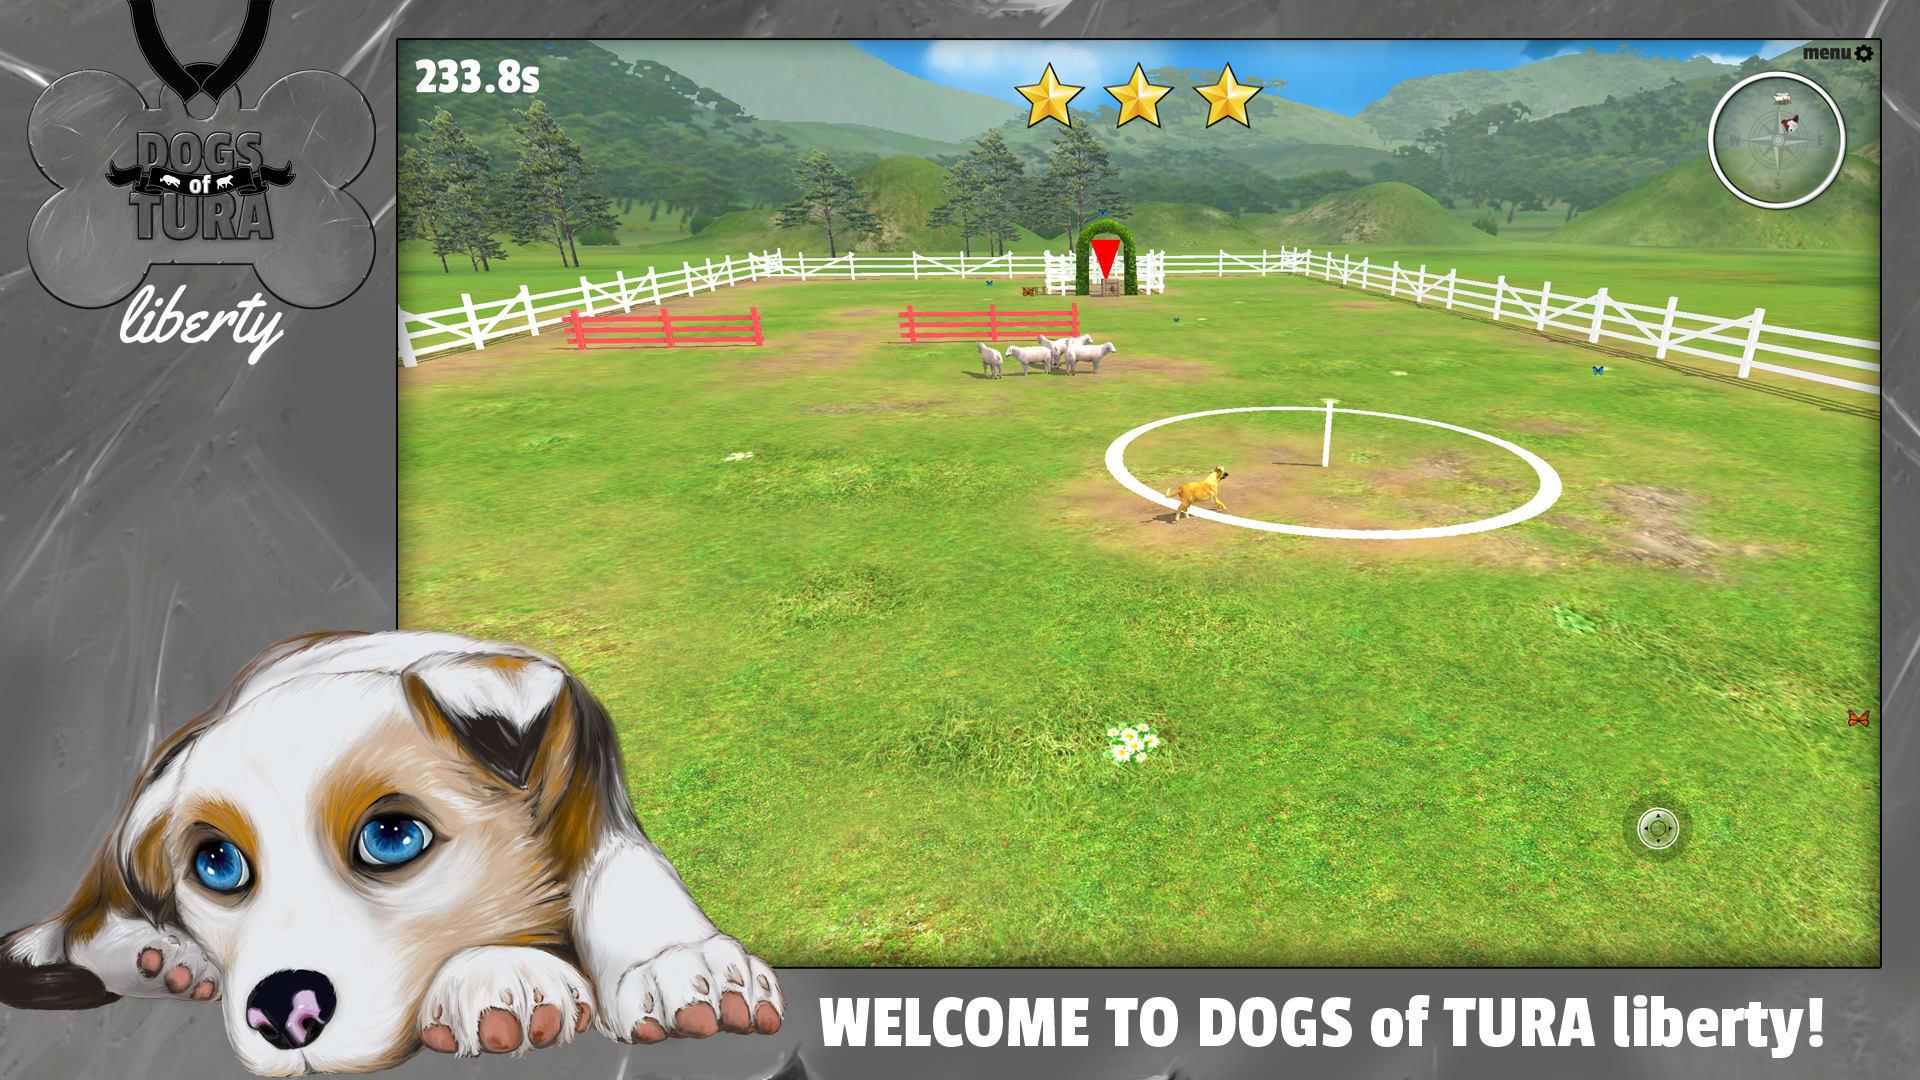 DOGS of TURA liberty